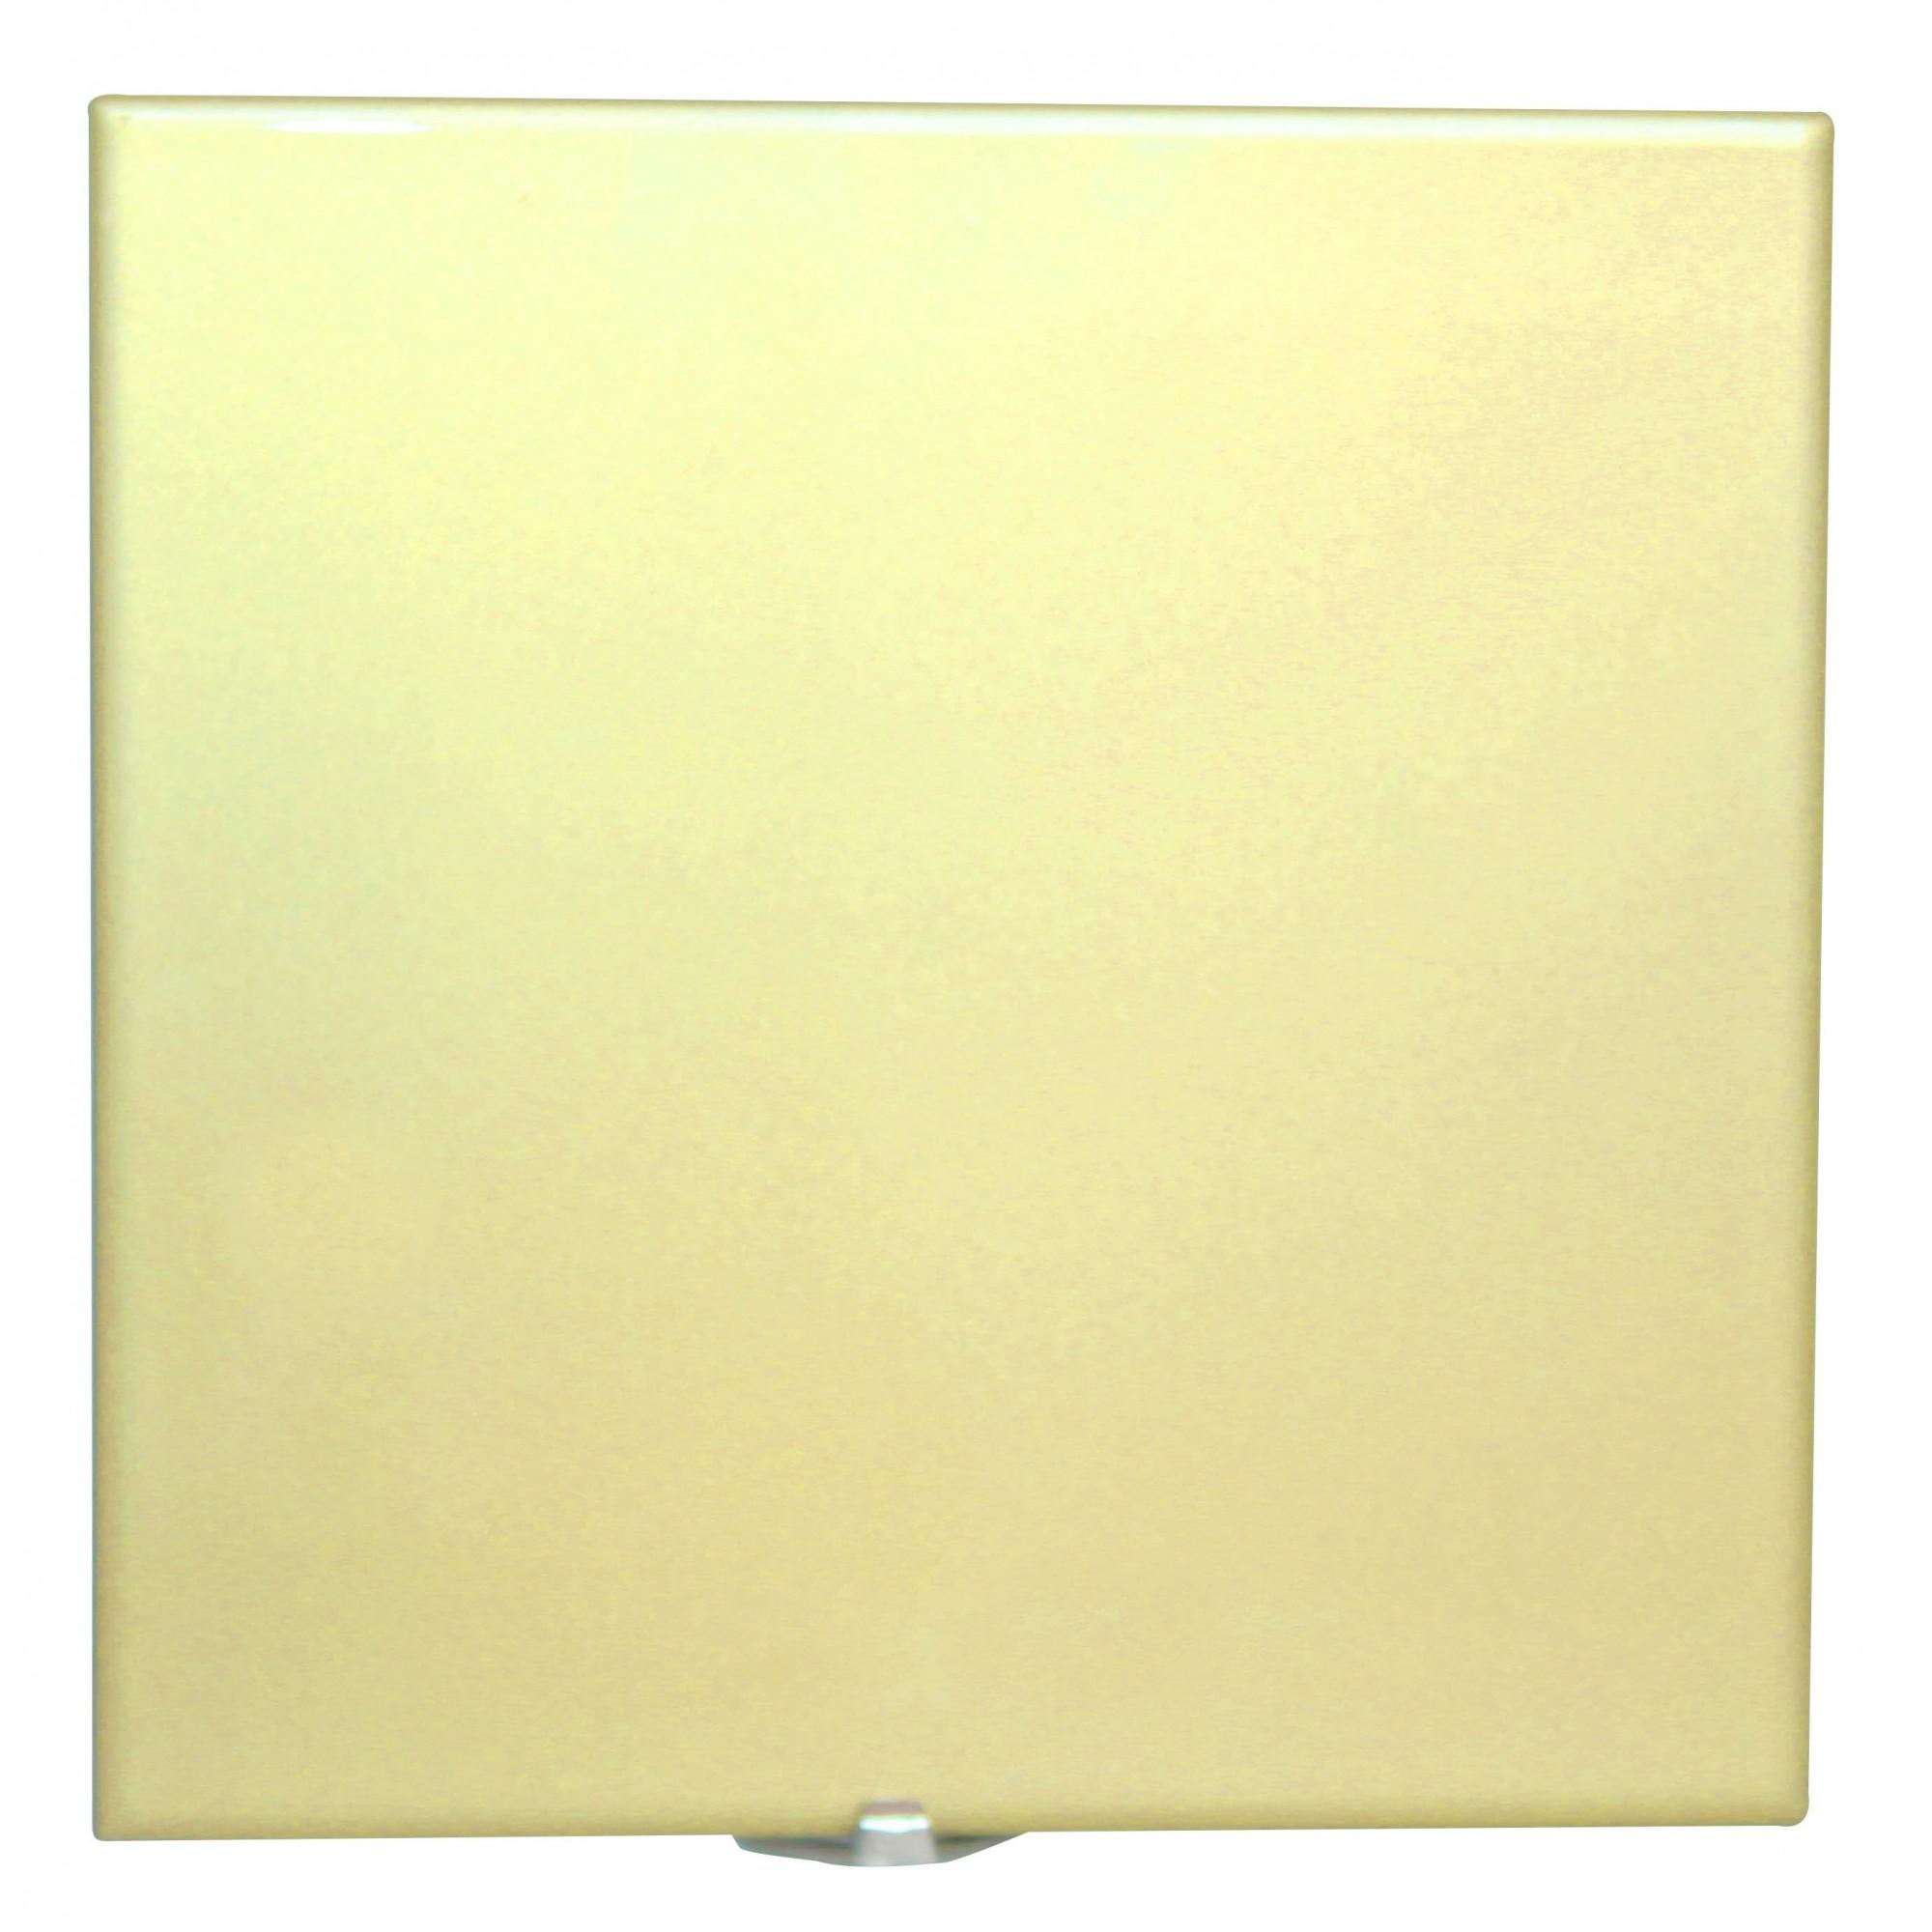 Azulejo 20x20 Dourado